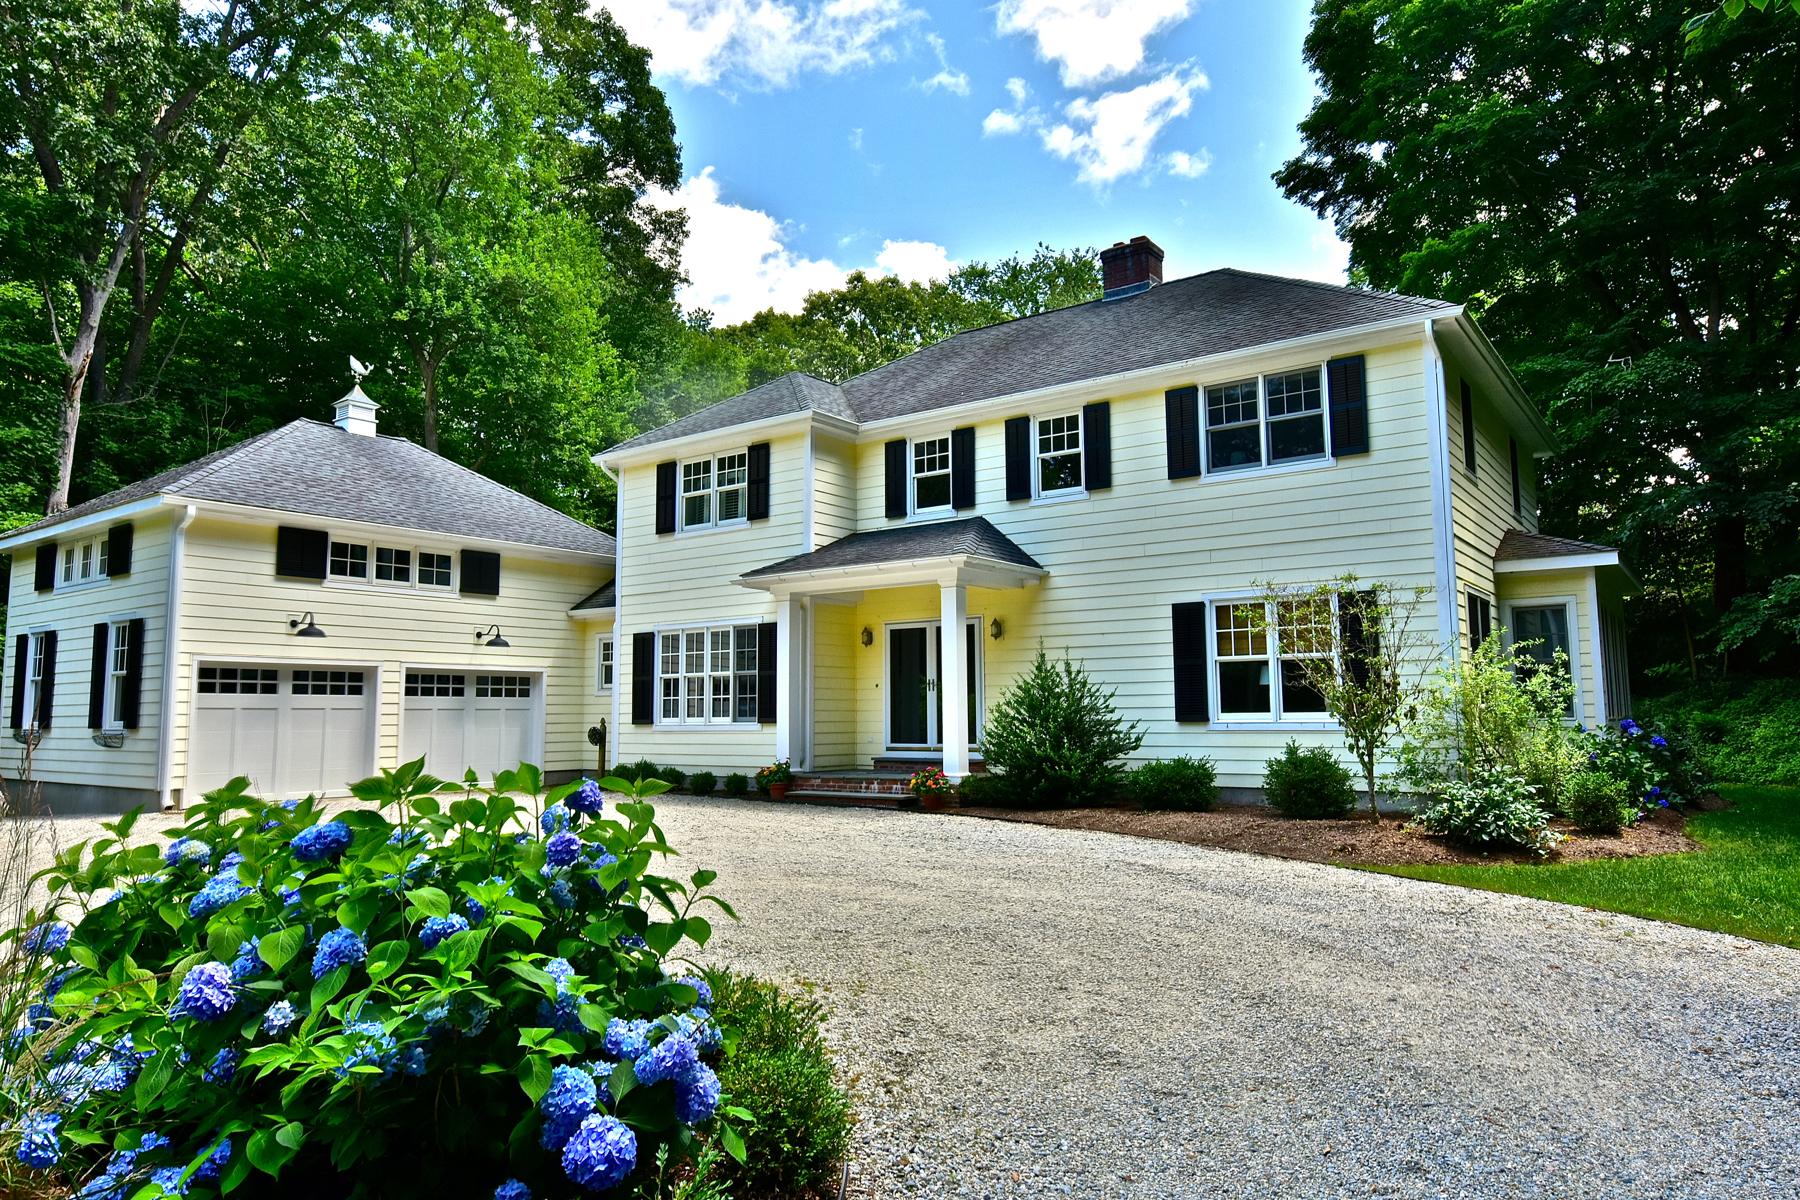 Moradia para Venda às Maine Coastal Cottage Style Home 17 Laurel Rd Essex, Connecticut 06426 Estados Unidos